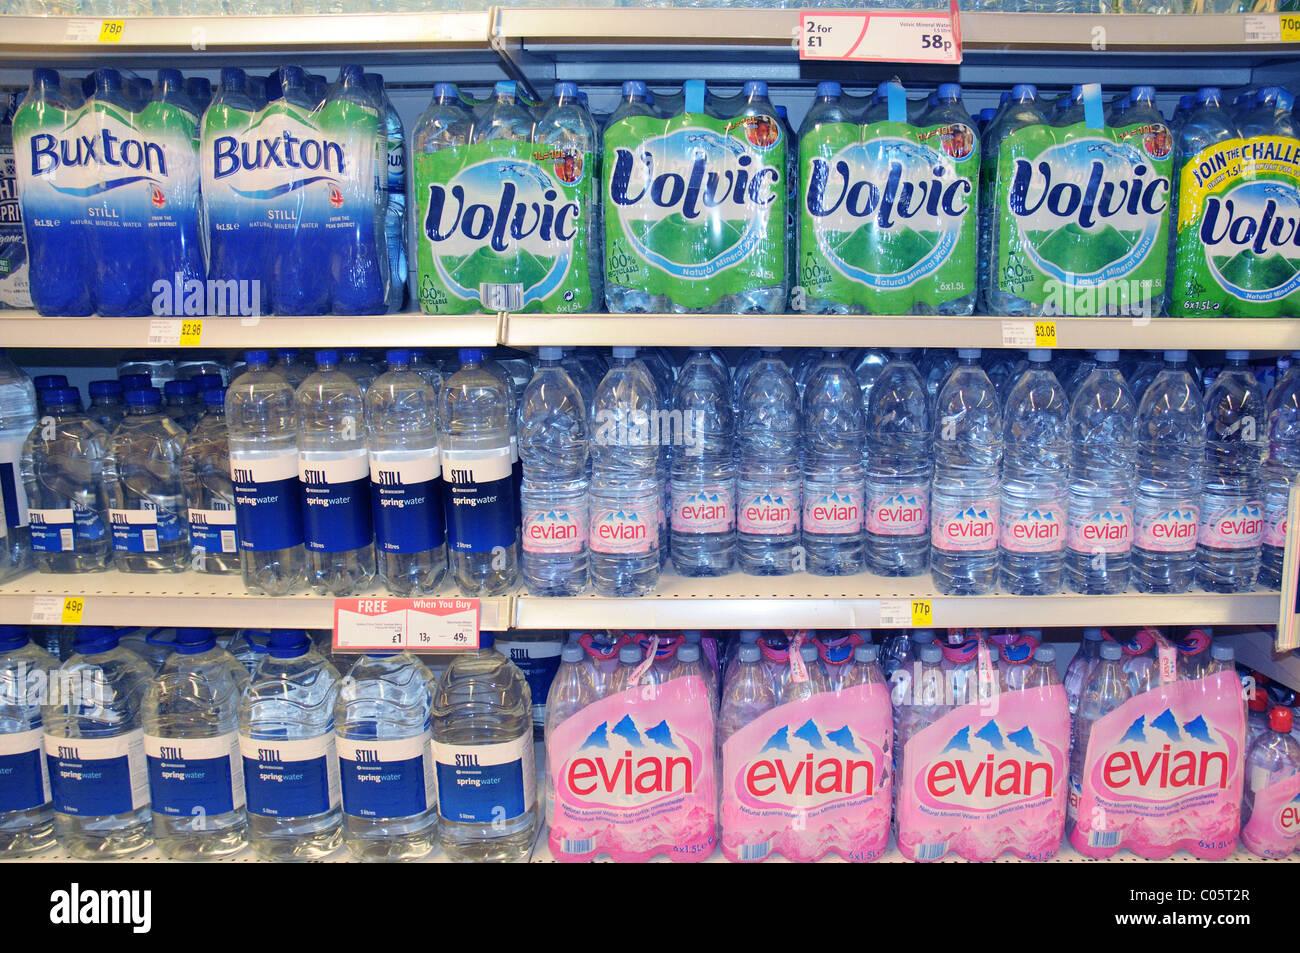 Agua embotellada en un estante en un supermercado en Inglaterra Imagen De Stock